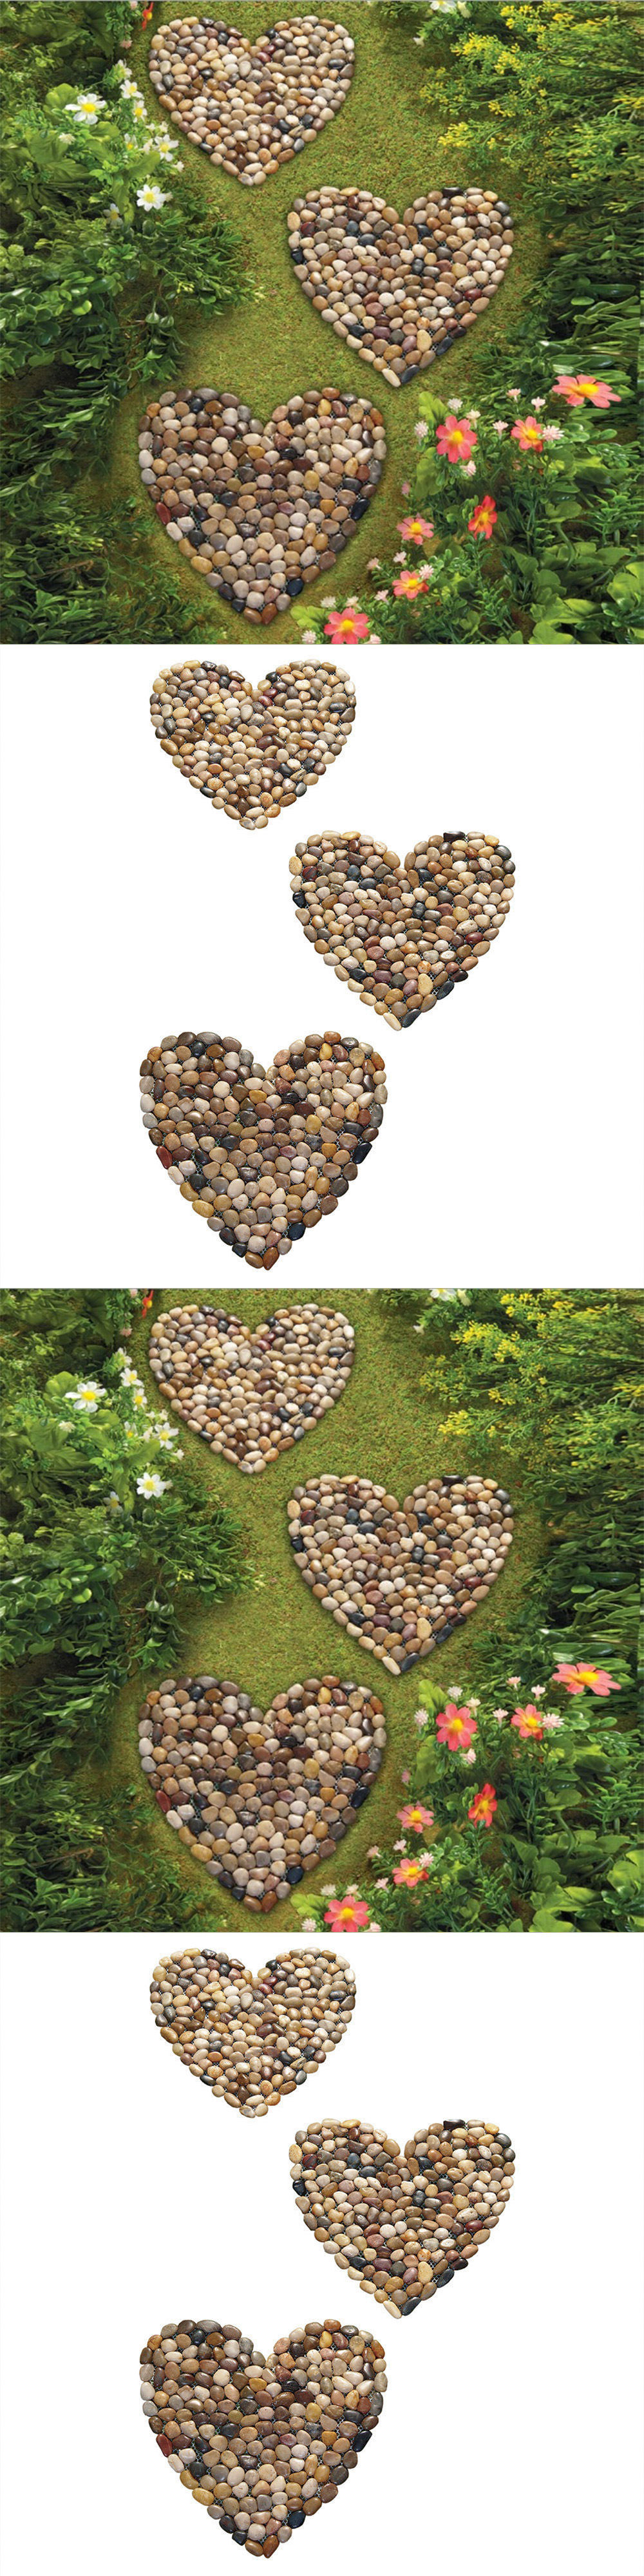 Inspirational Stones for Yard Decoration